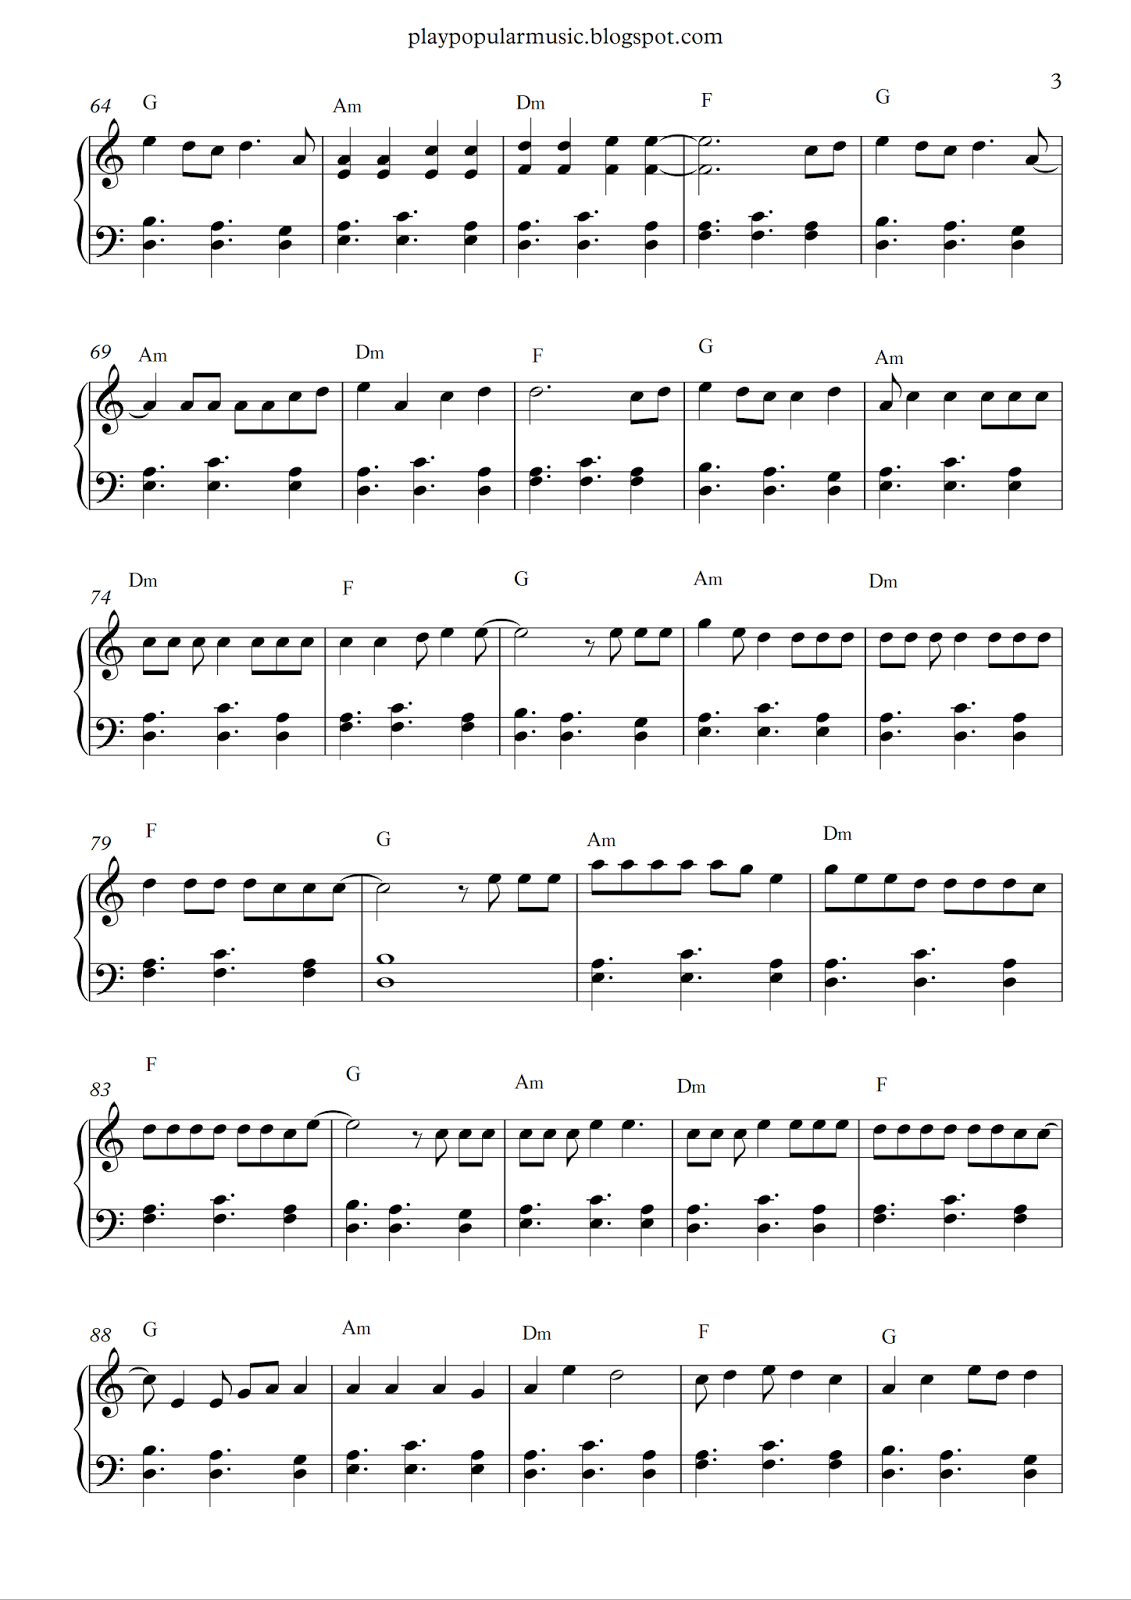 Free Piano Sheet Music Shape Of You Ed Sheeran Pdf Your Love Was Handmade For Somebody Like Me The Club I Piano Sheet Music Free Piano Sheet Music Piano Music